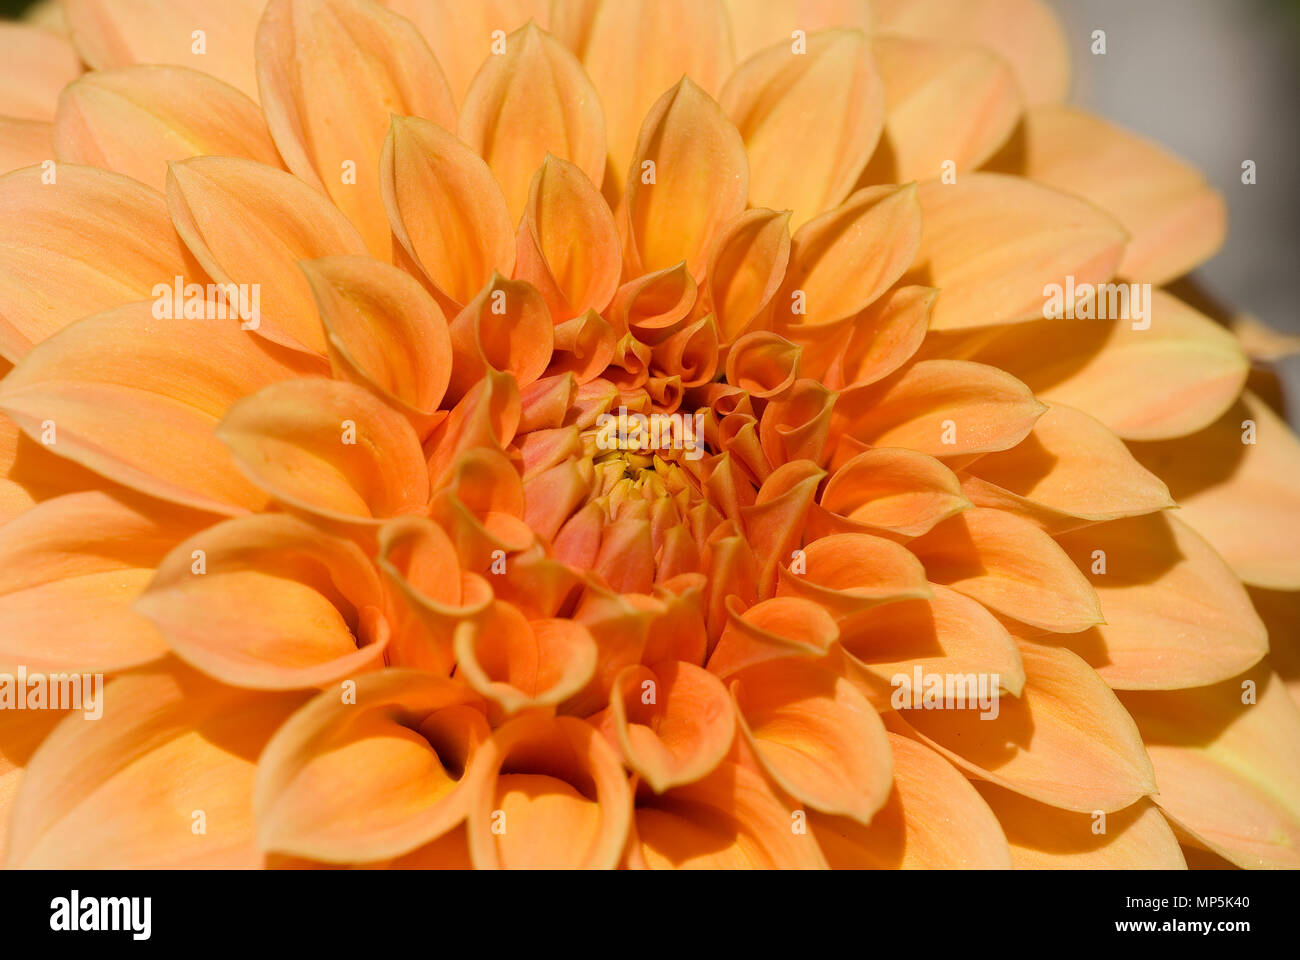 Close Up Detail Or Orange Dahlia Flower Stock Photo 185750880 Alamy